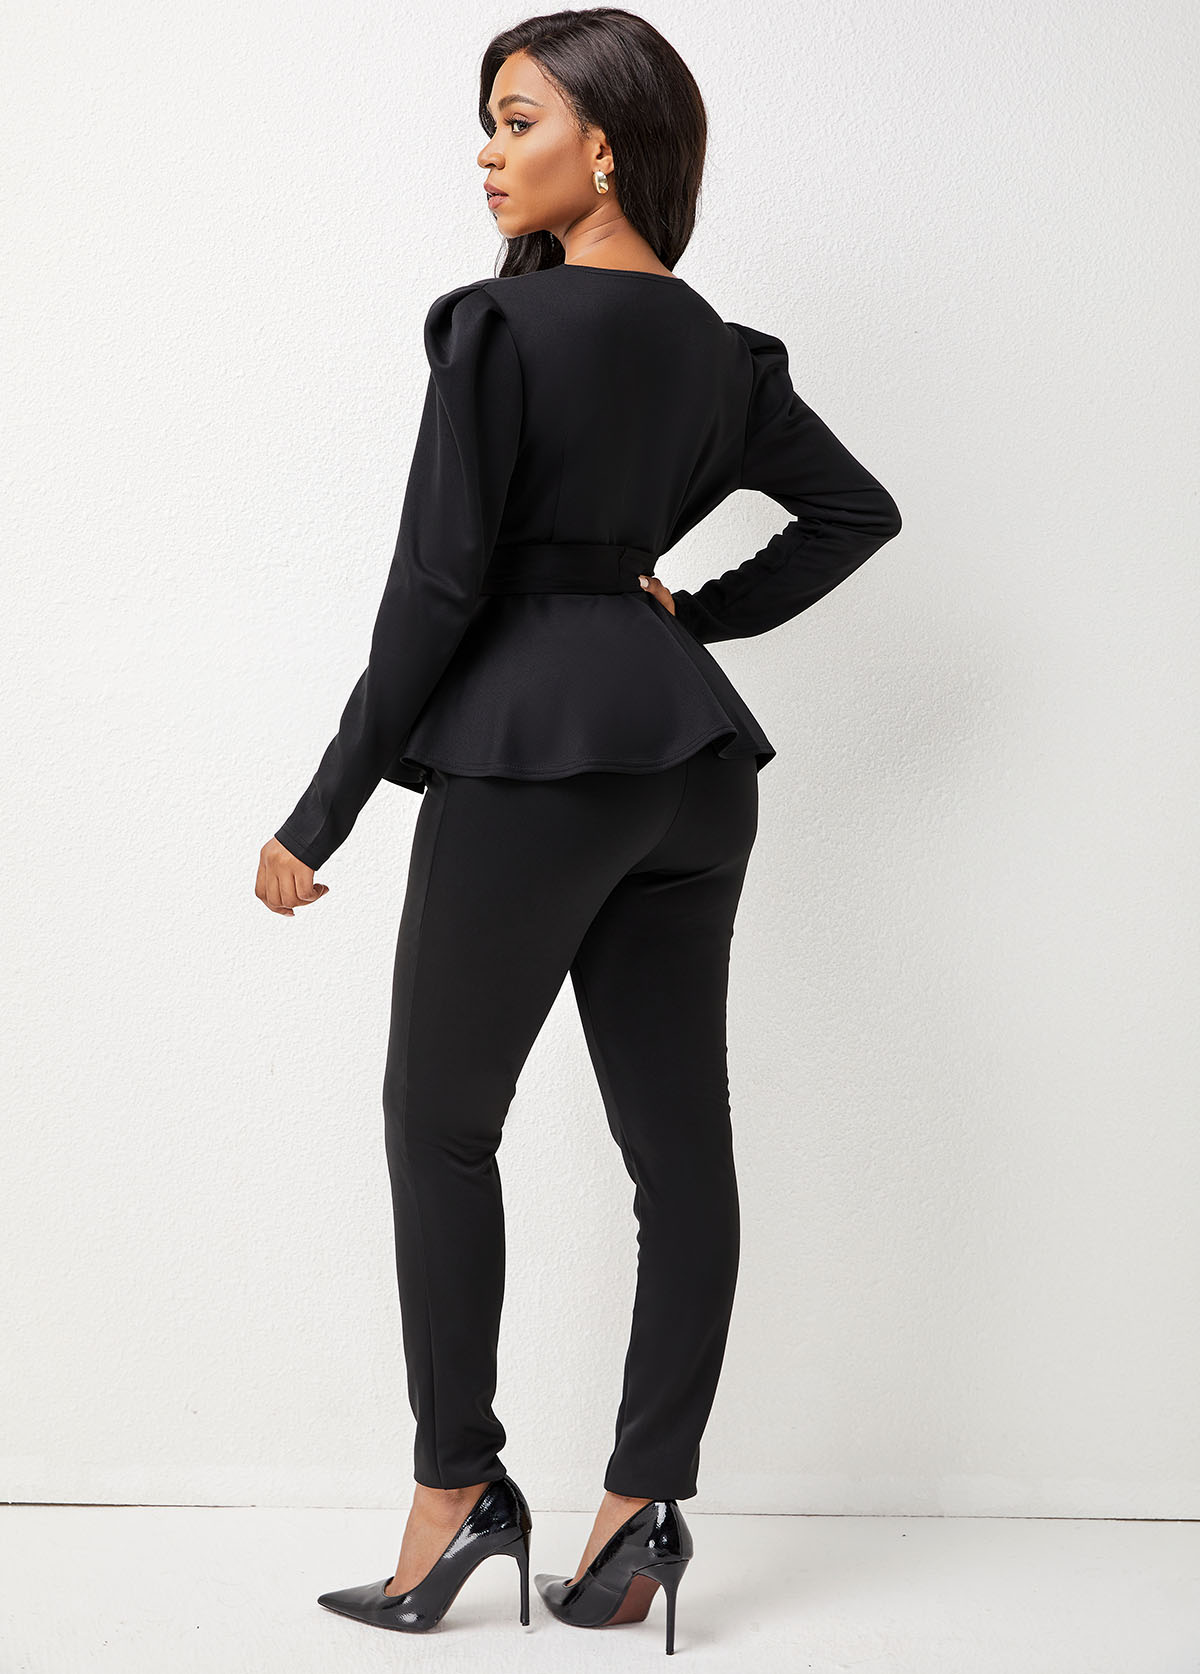 Tie Front Deep V Neck Long Sleeve Sweatsuit